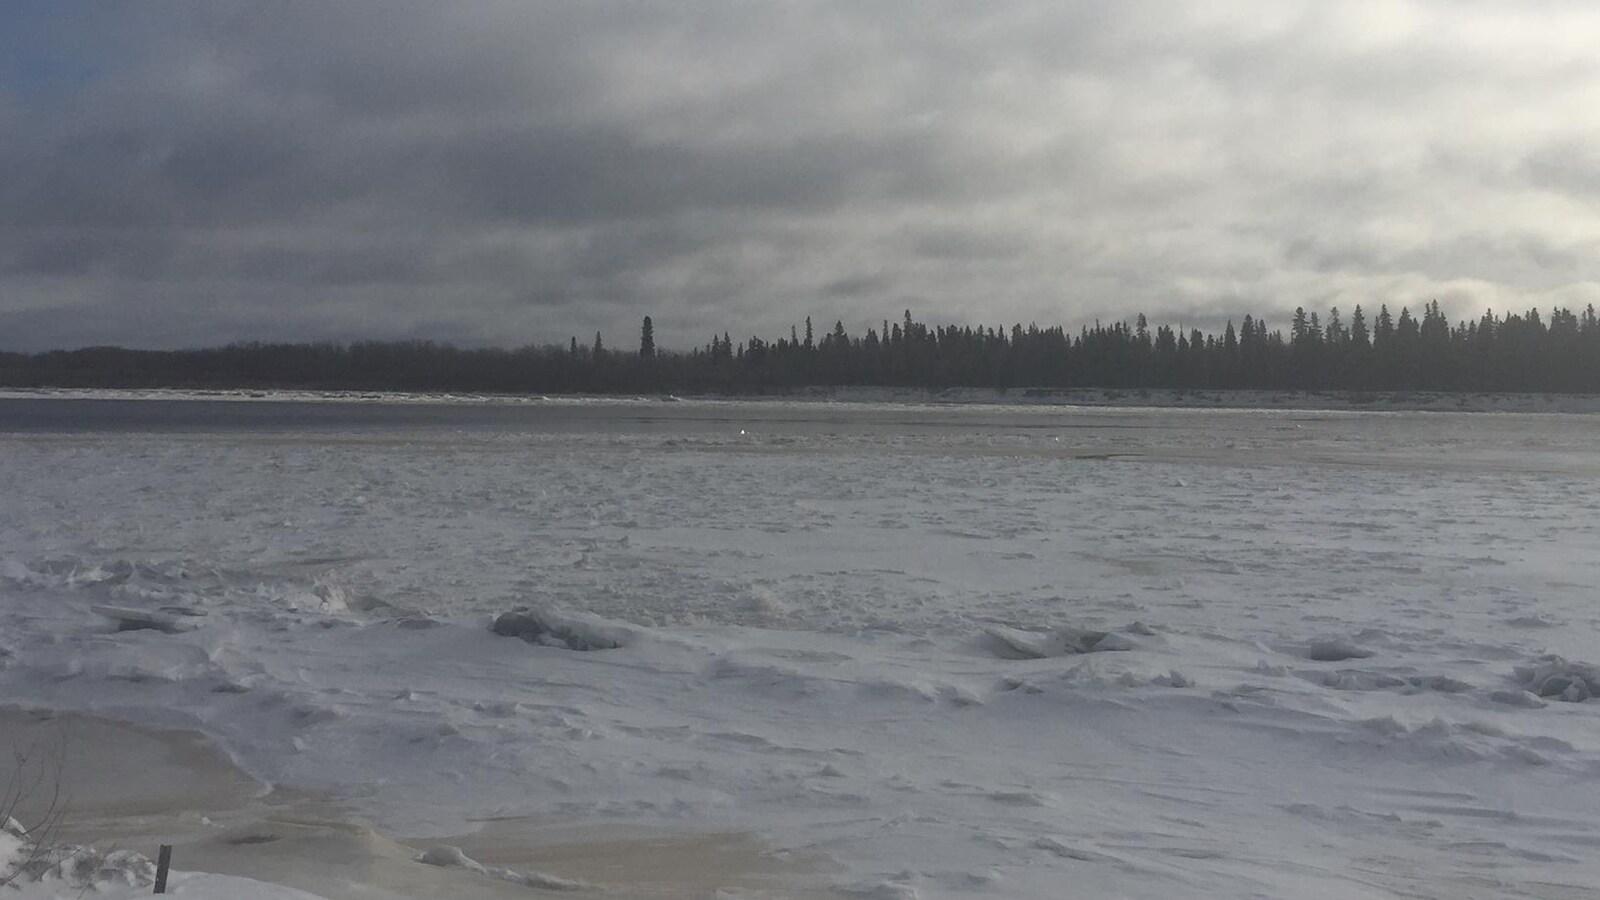 Rivière Moosonee avec de la glace mince.